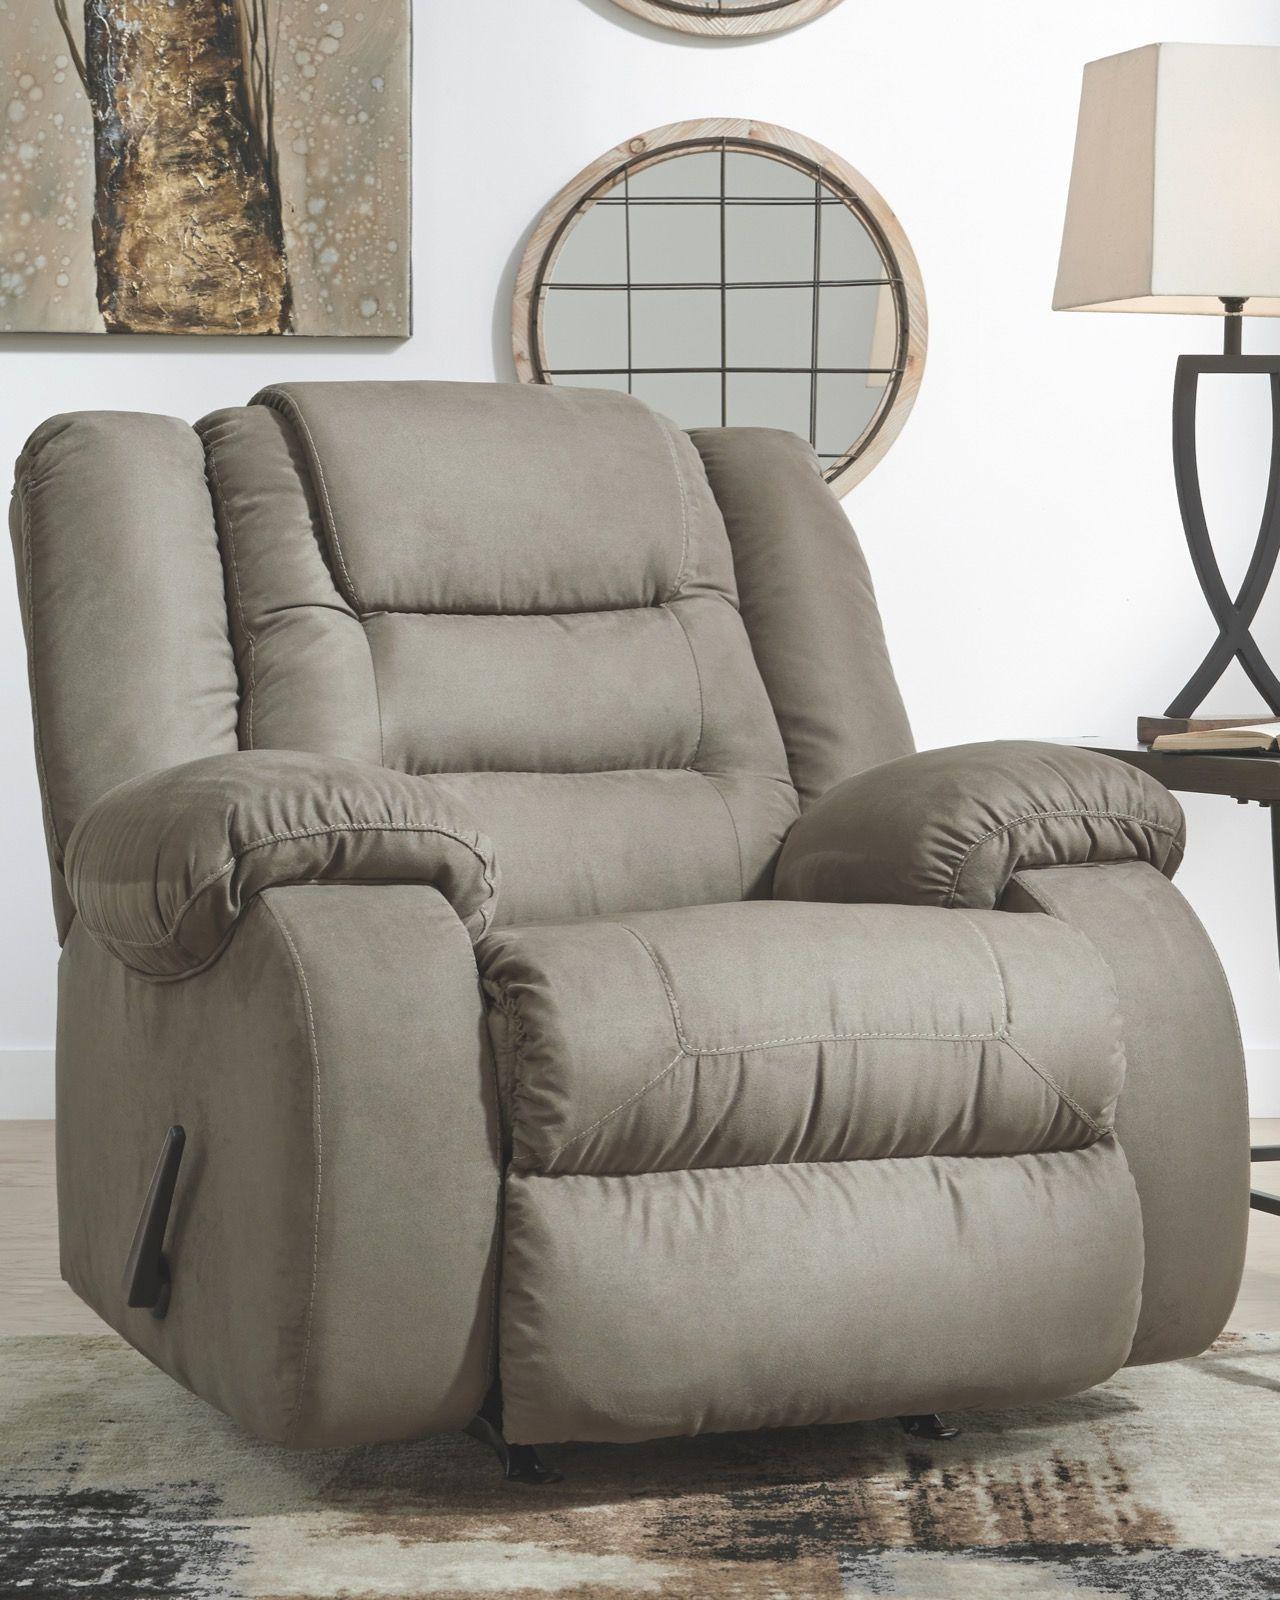 Astounding Signature Design Mccade Cobblestone Rocker Recliner Unemploymentrelief Wooden Chair Designs For Living Room Unemploymentrelieforg